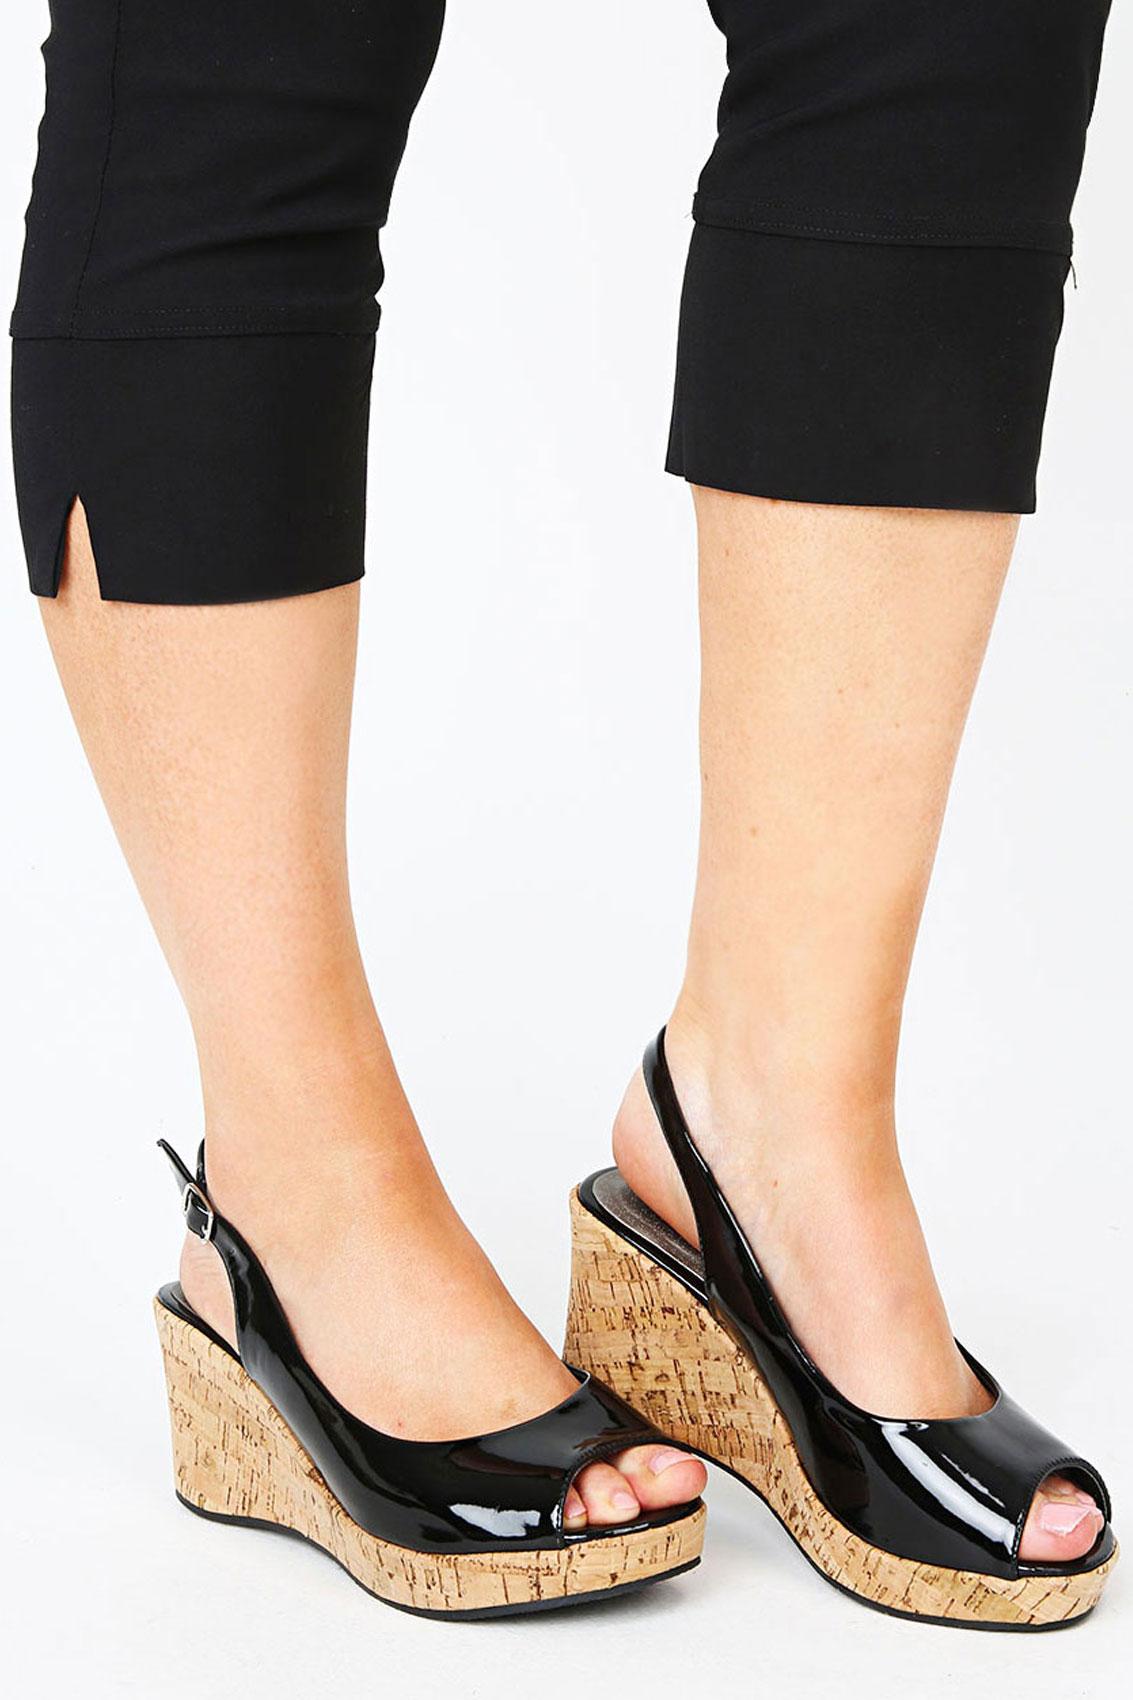 Black Patent Peep Toe Cork Wedge Sandal In A EEE Fit Size